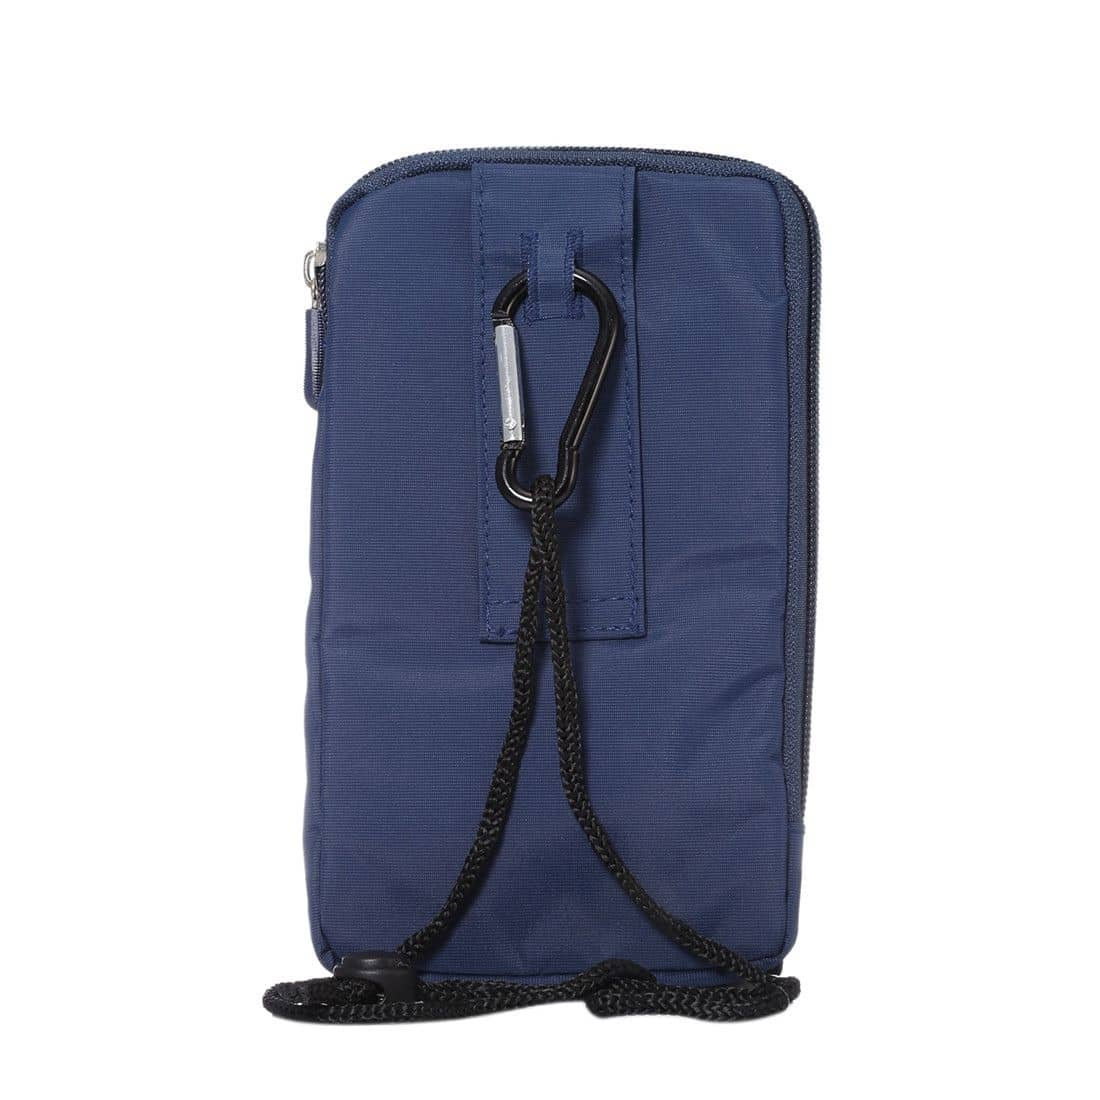 para-CECT-N85-Funda-Azul-Multiusos-XXM-18x10cm-Cinturon-Universal